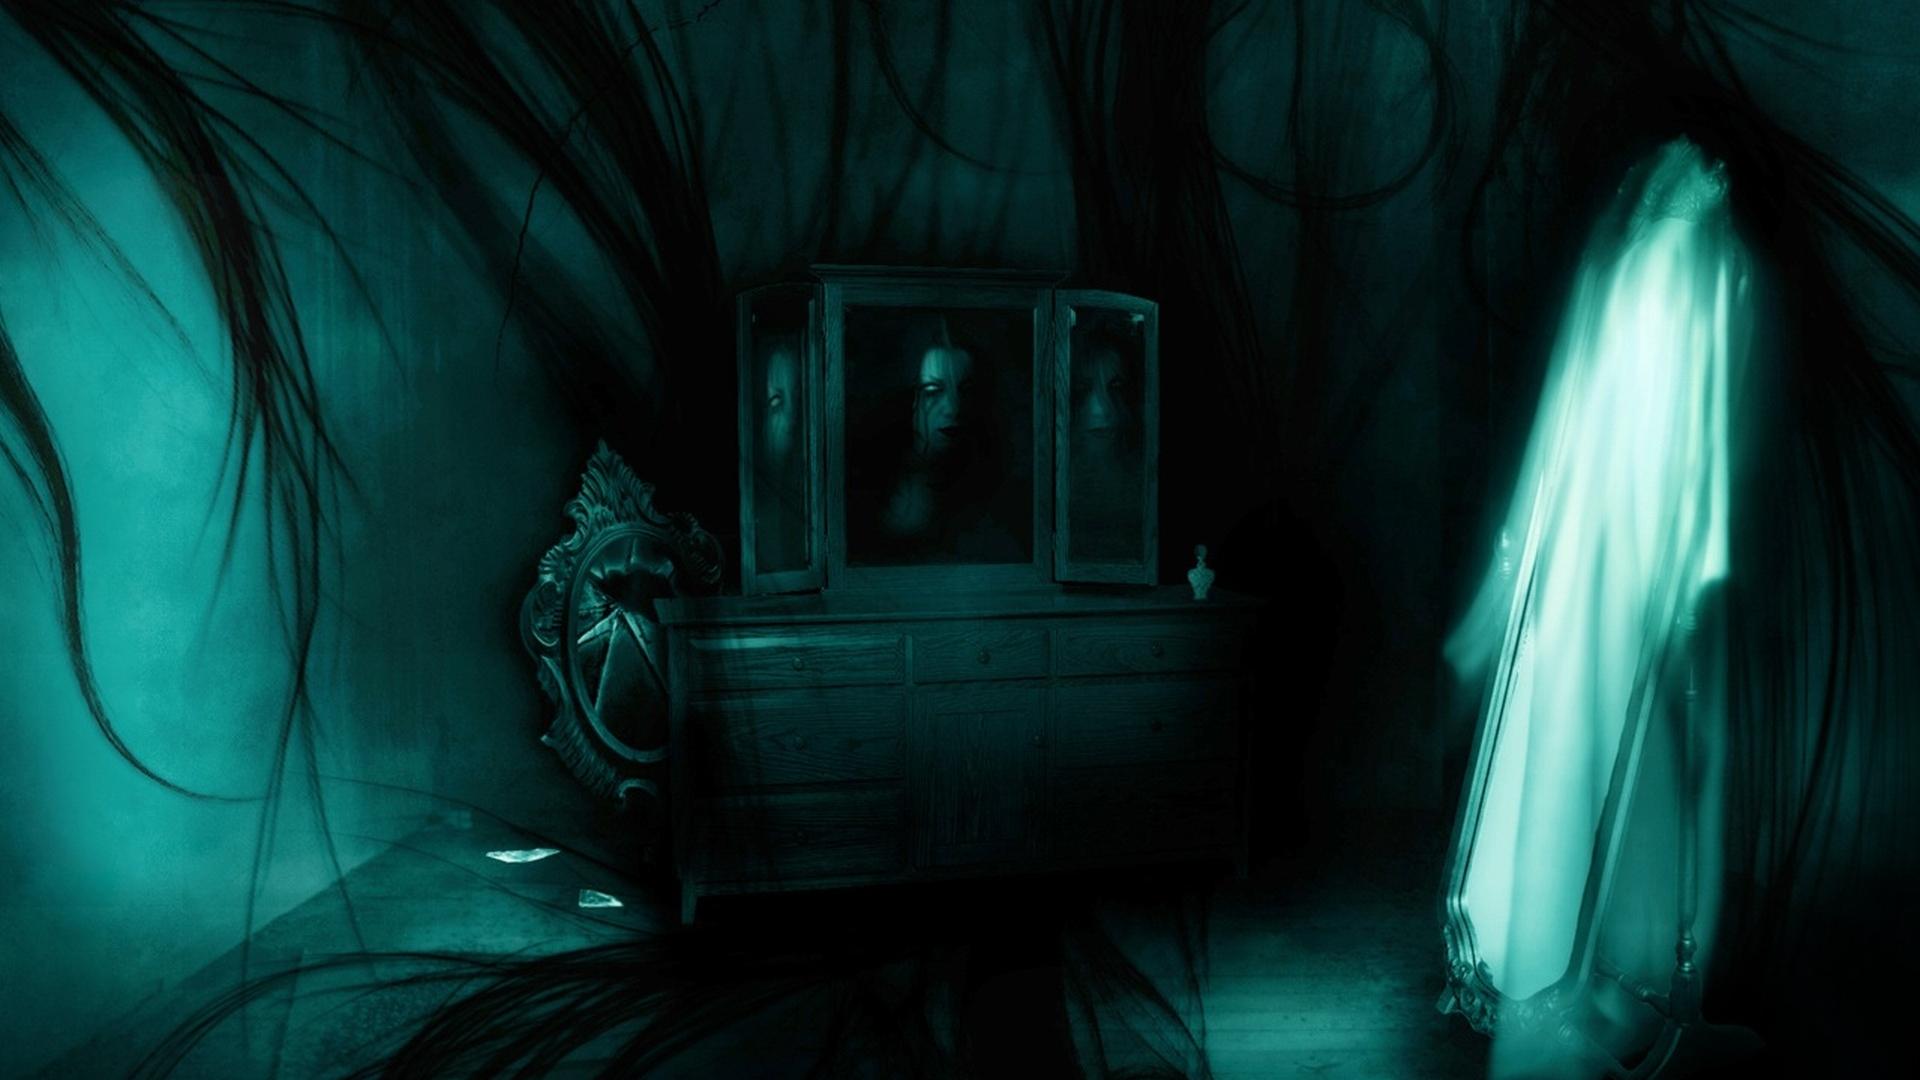 Dark Ghost Wallpaper 1920x1080 Dark Ghost 1920x1080